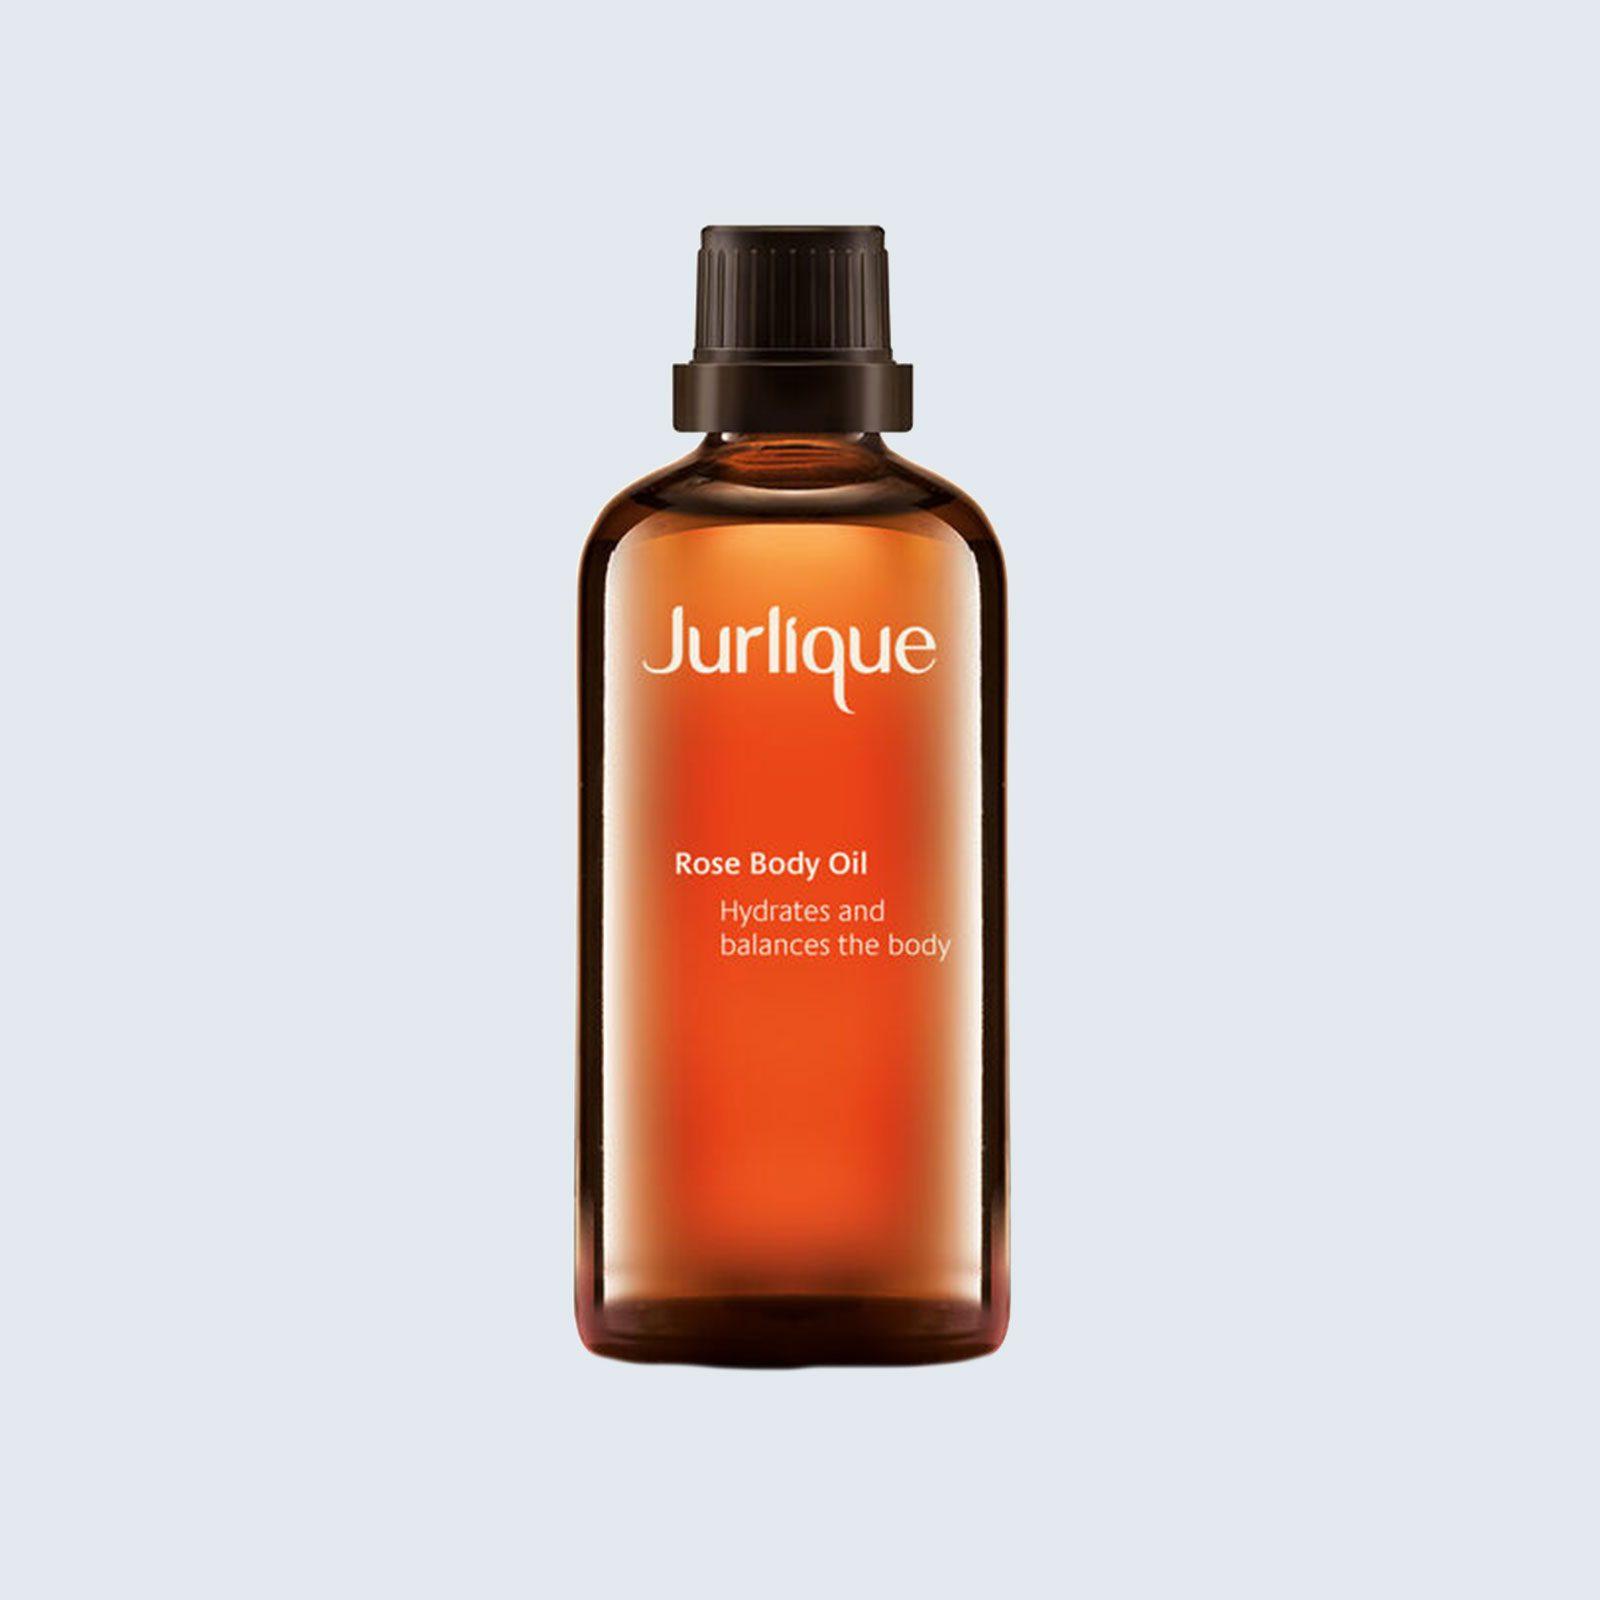 For practical luxury, Jurlique Rose Body Oil